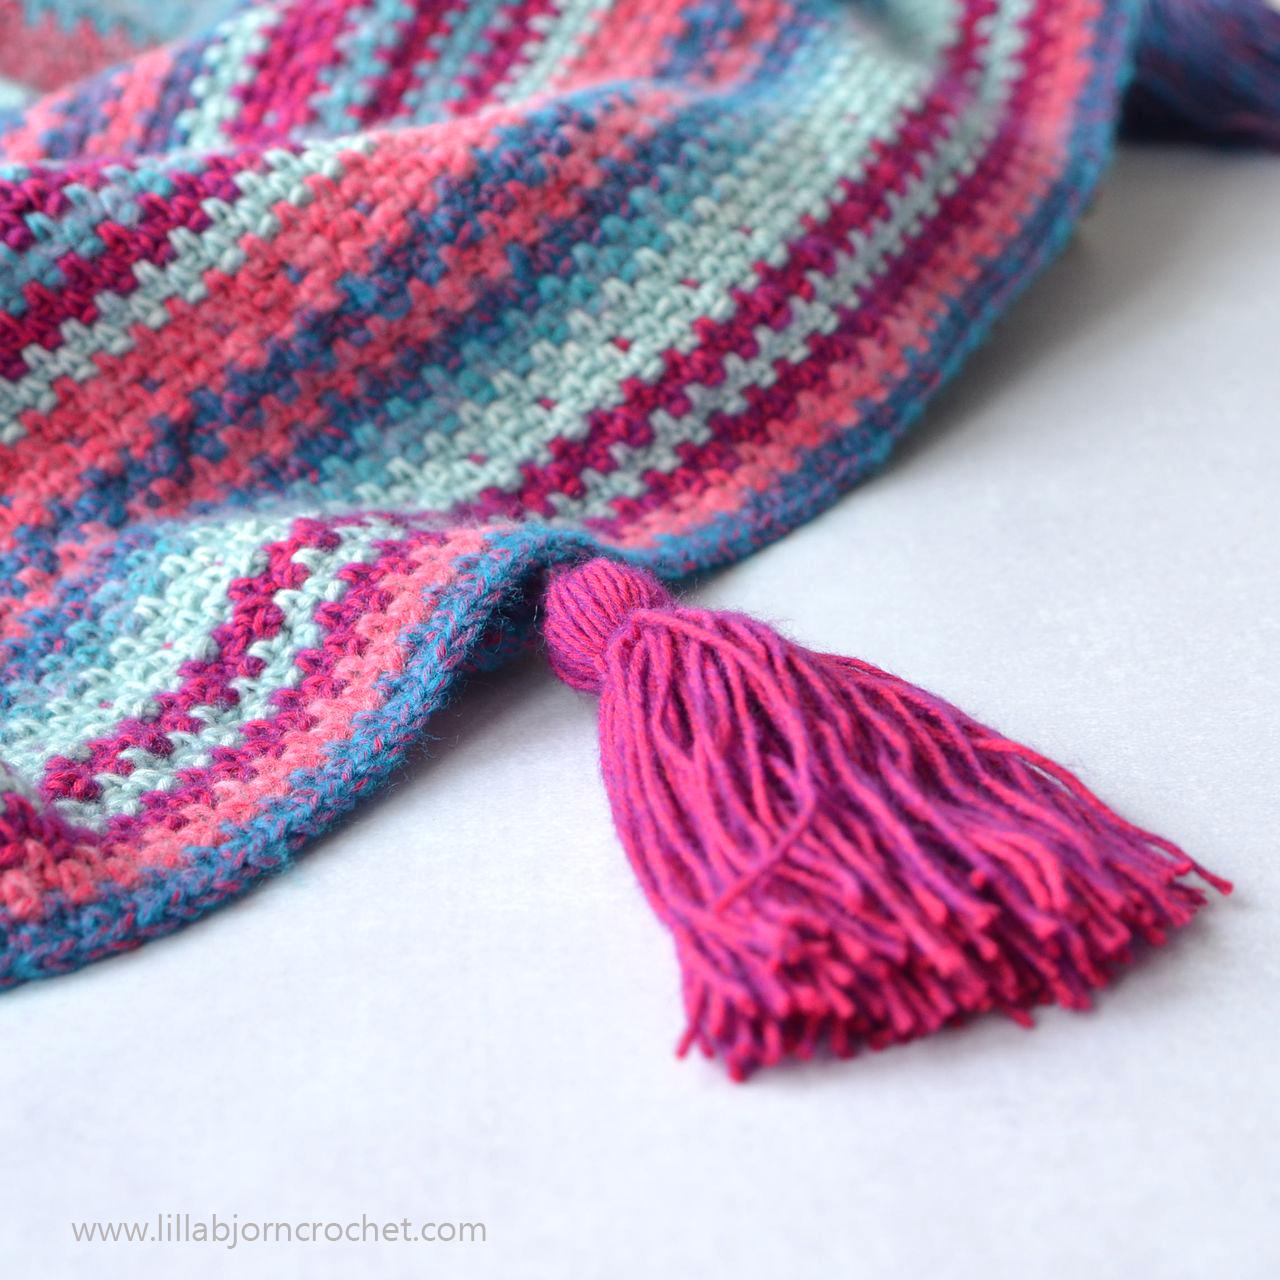 Crochet shawl with linen stitch - free pattern by www.lillabjorncrochet.com